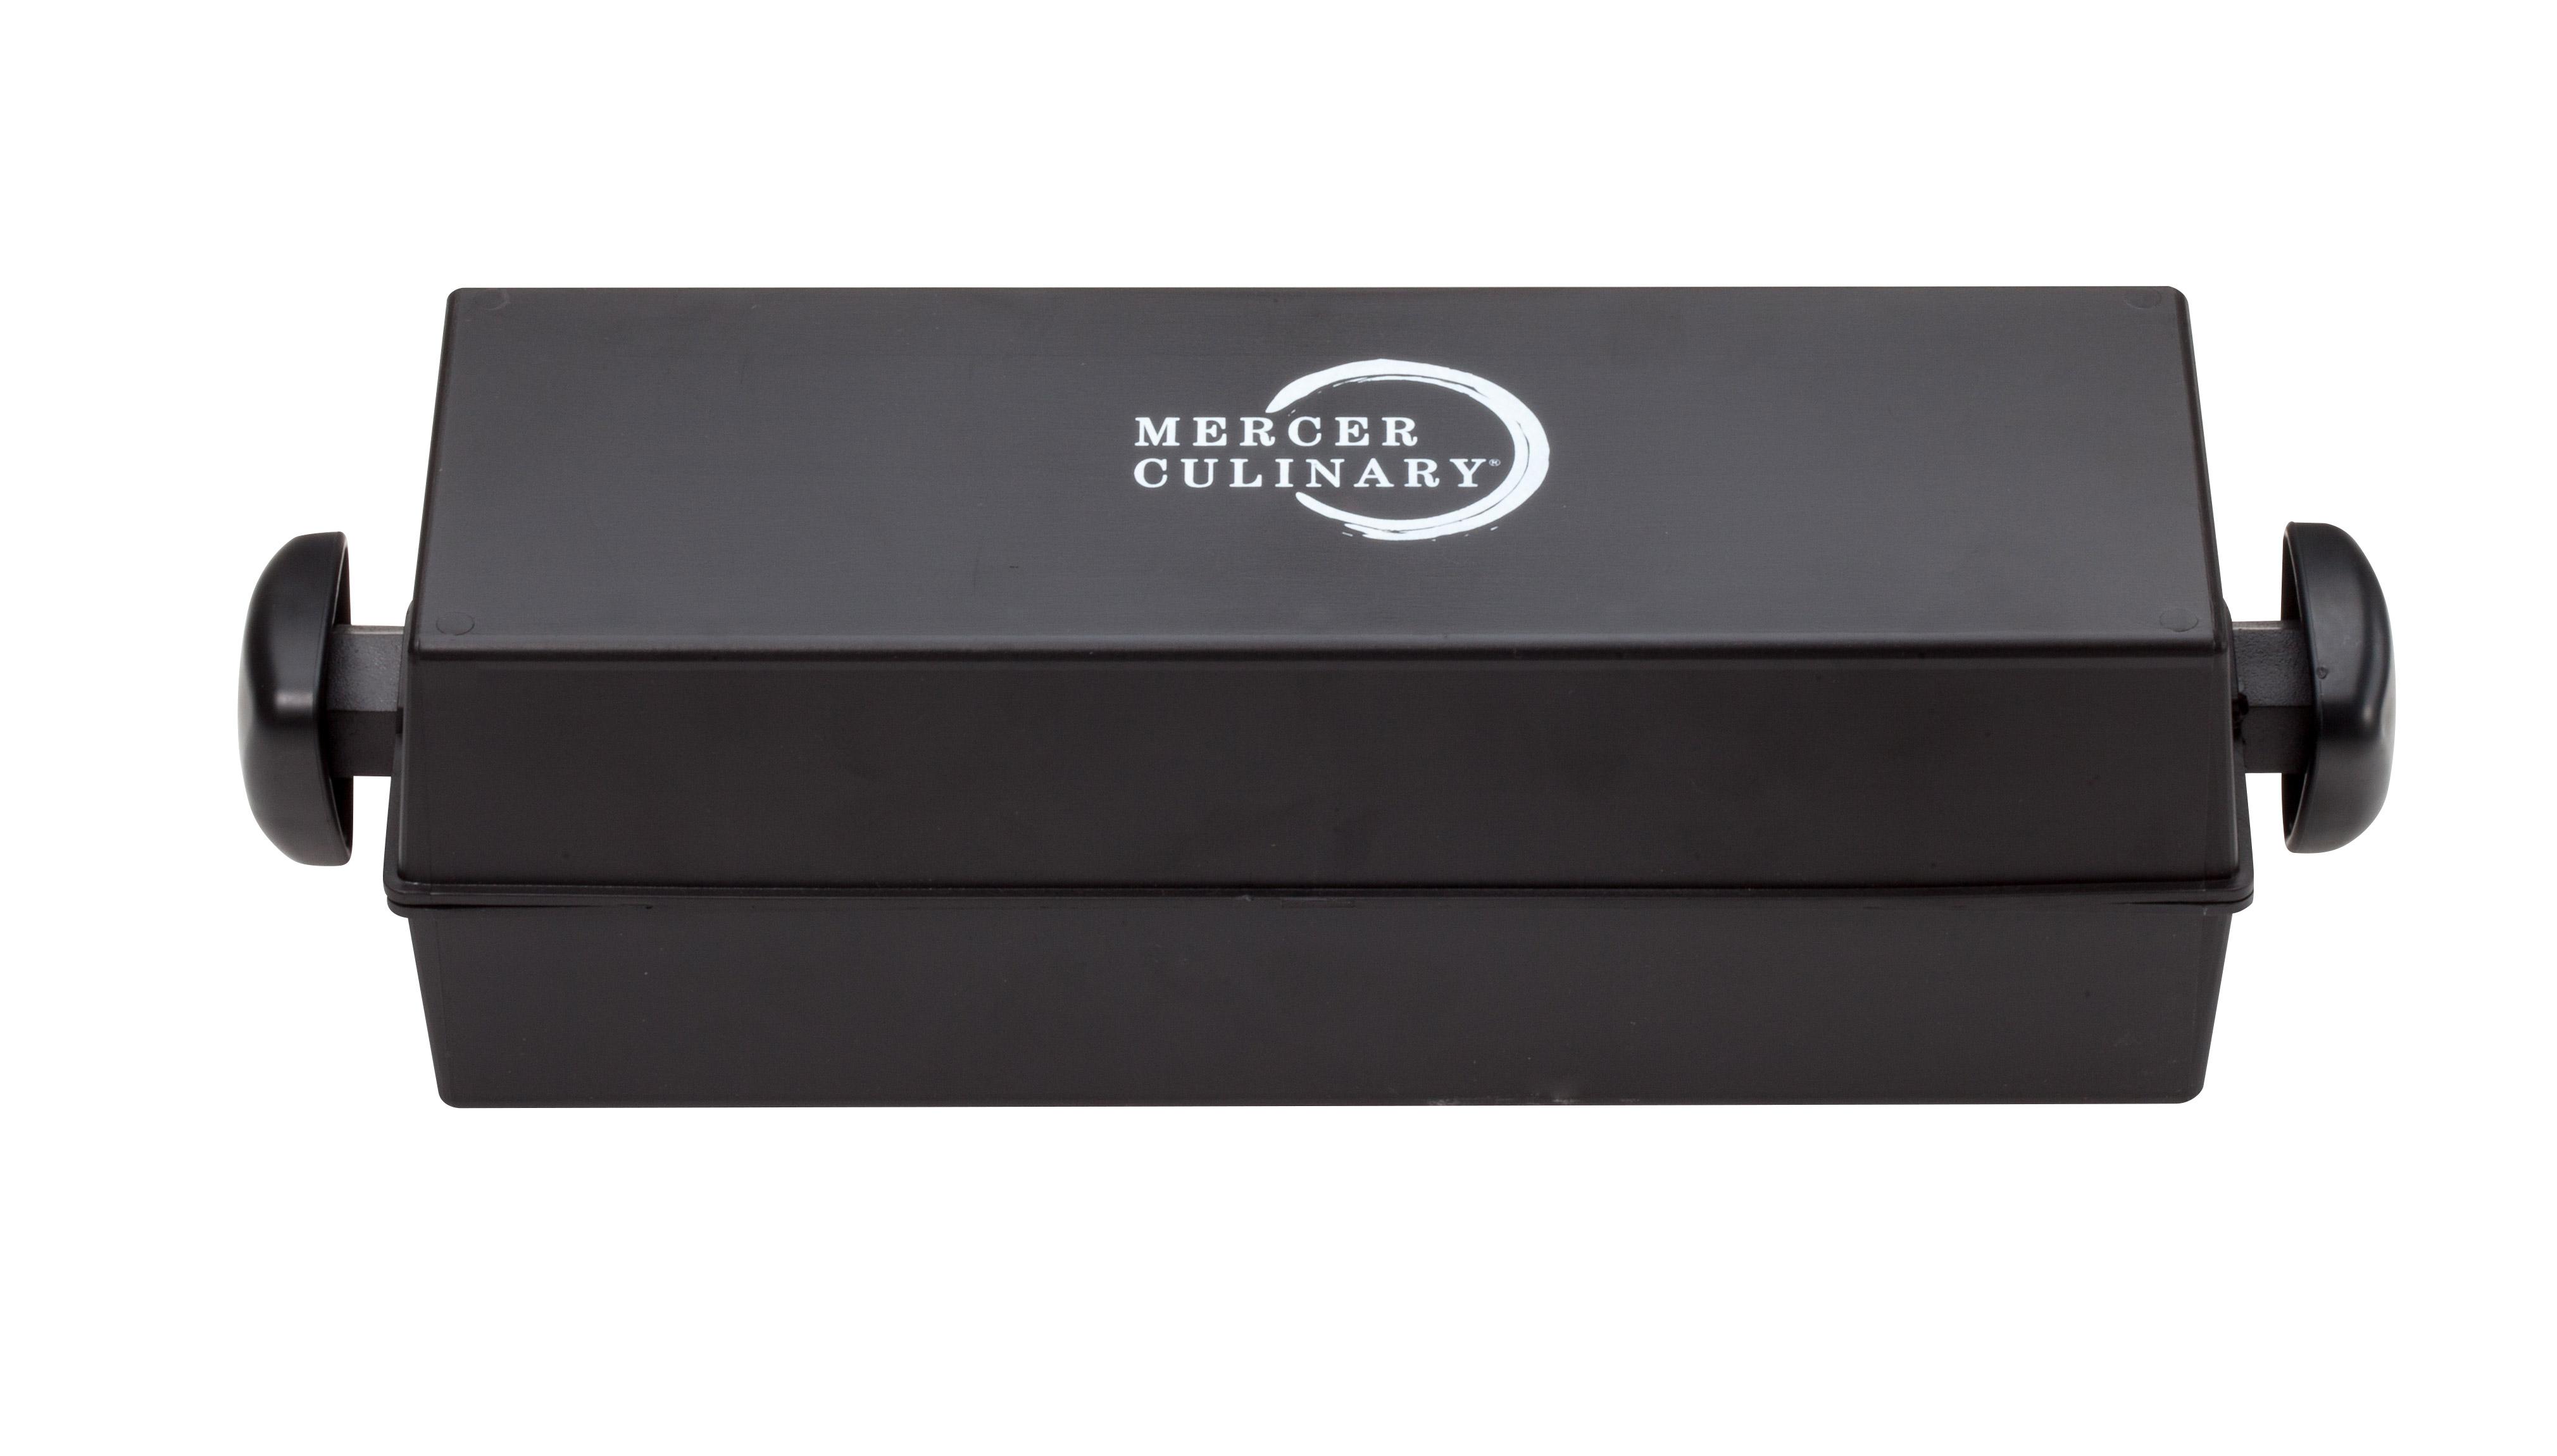 2900-91 Mercer Culinary M15930 knife, sharpener honing system